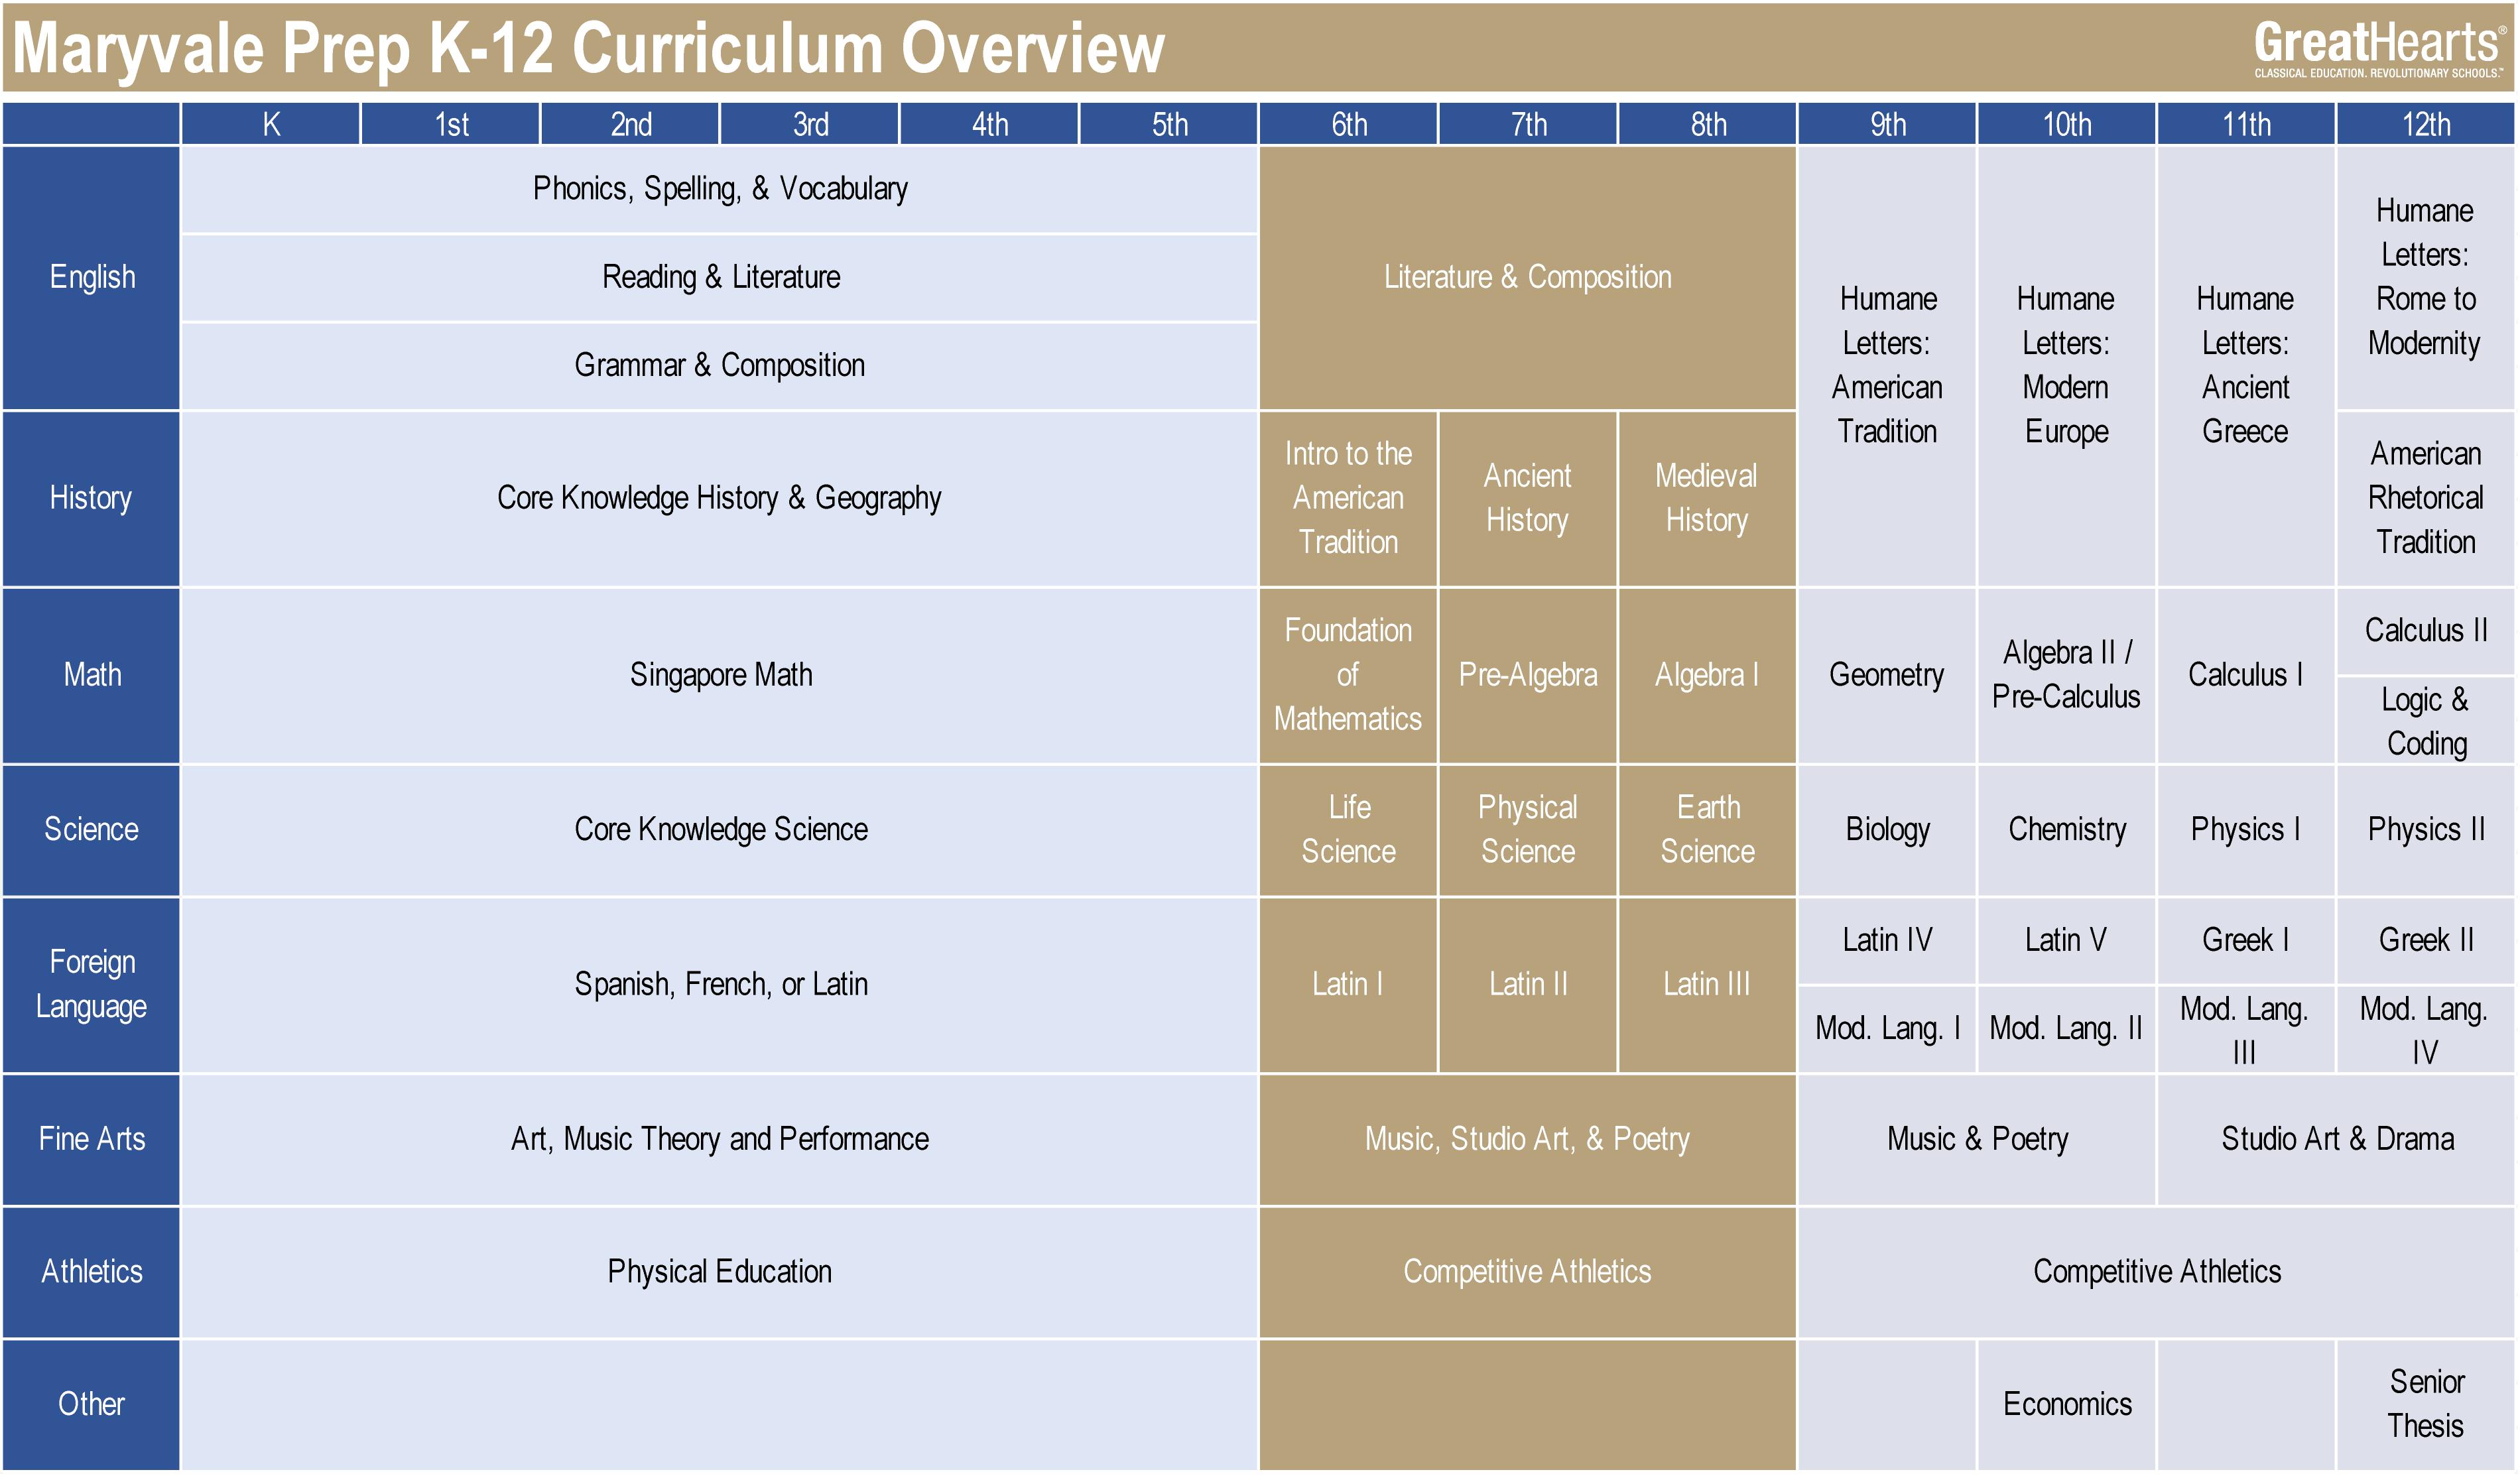 Maryvale Prep K-12 curriculum